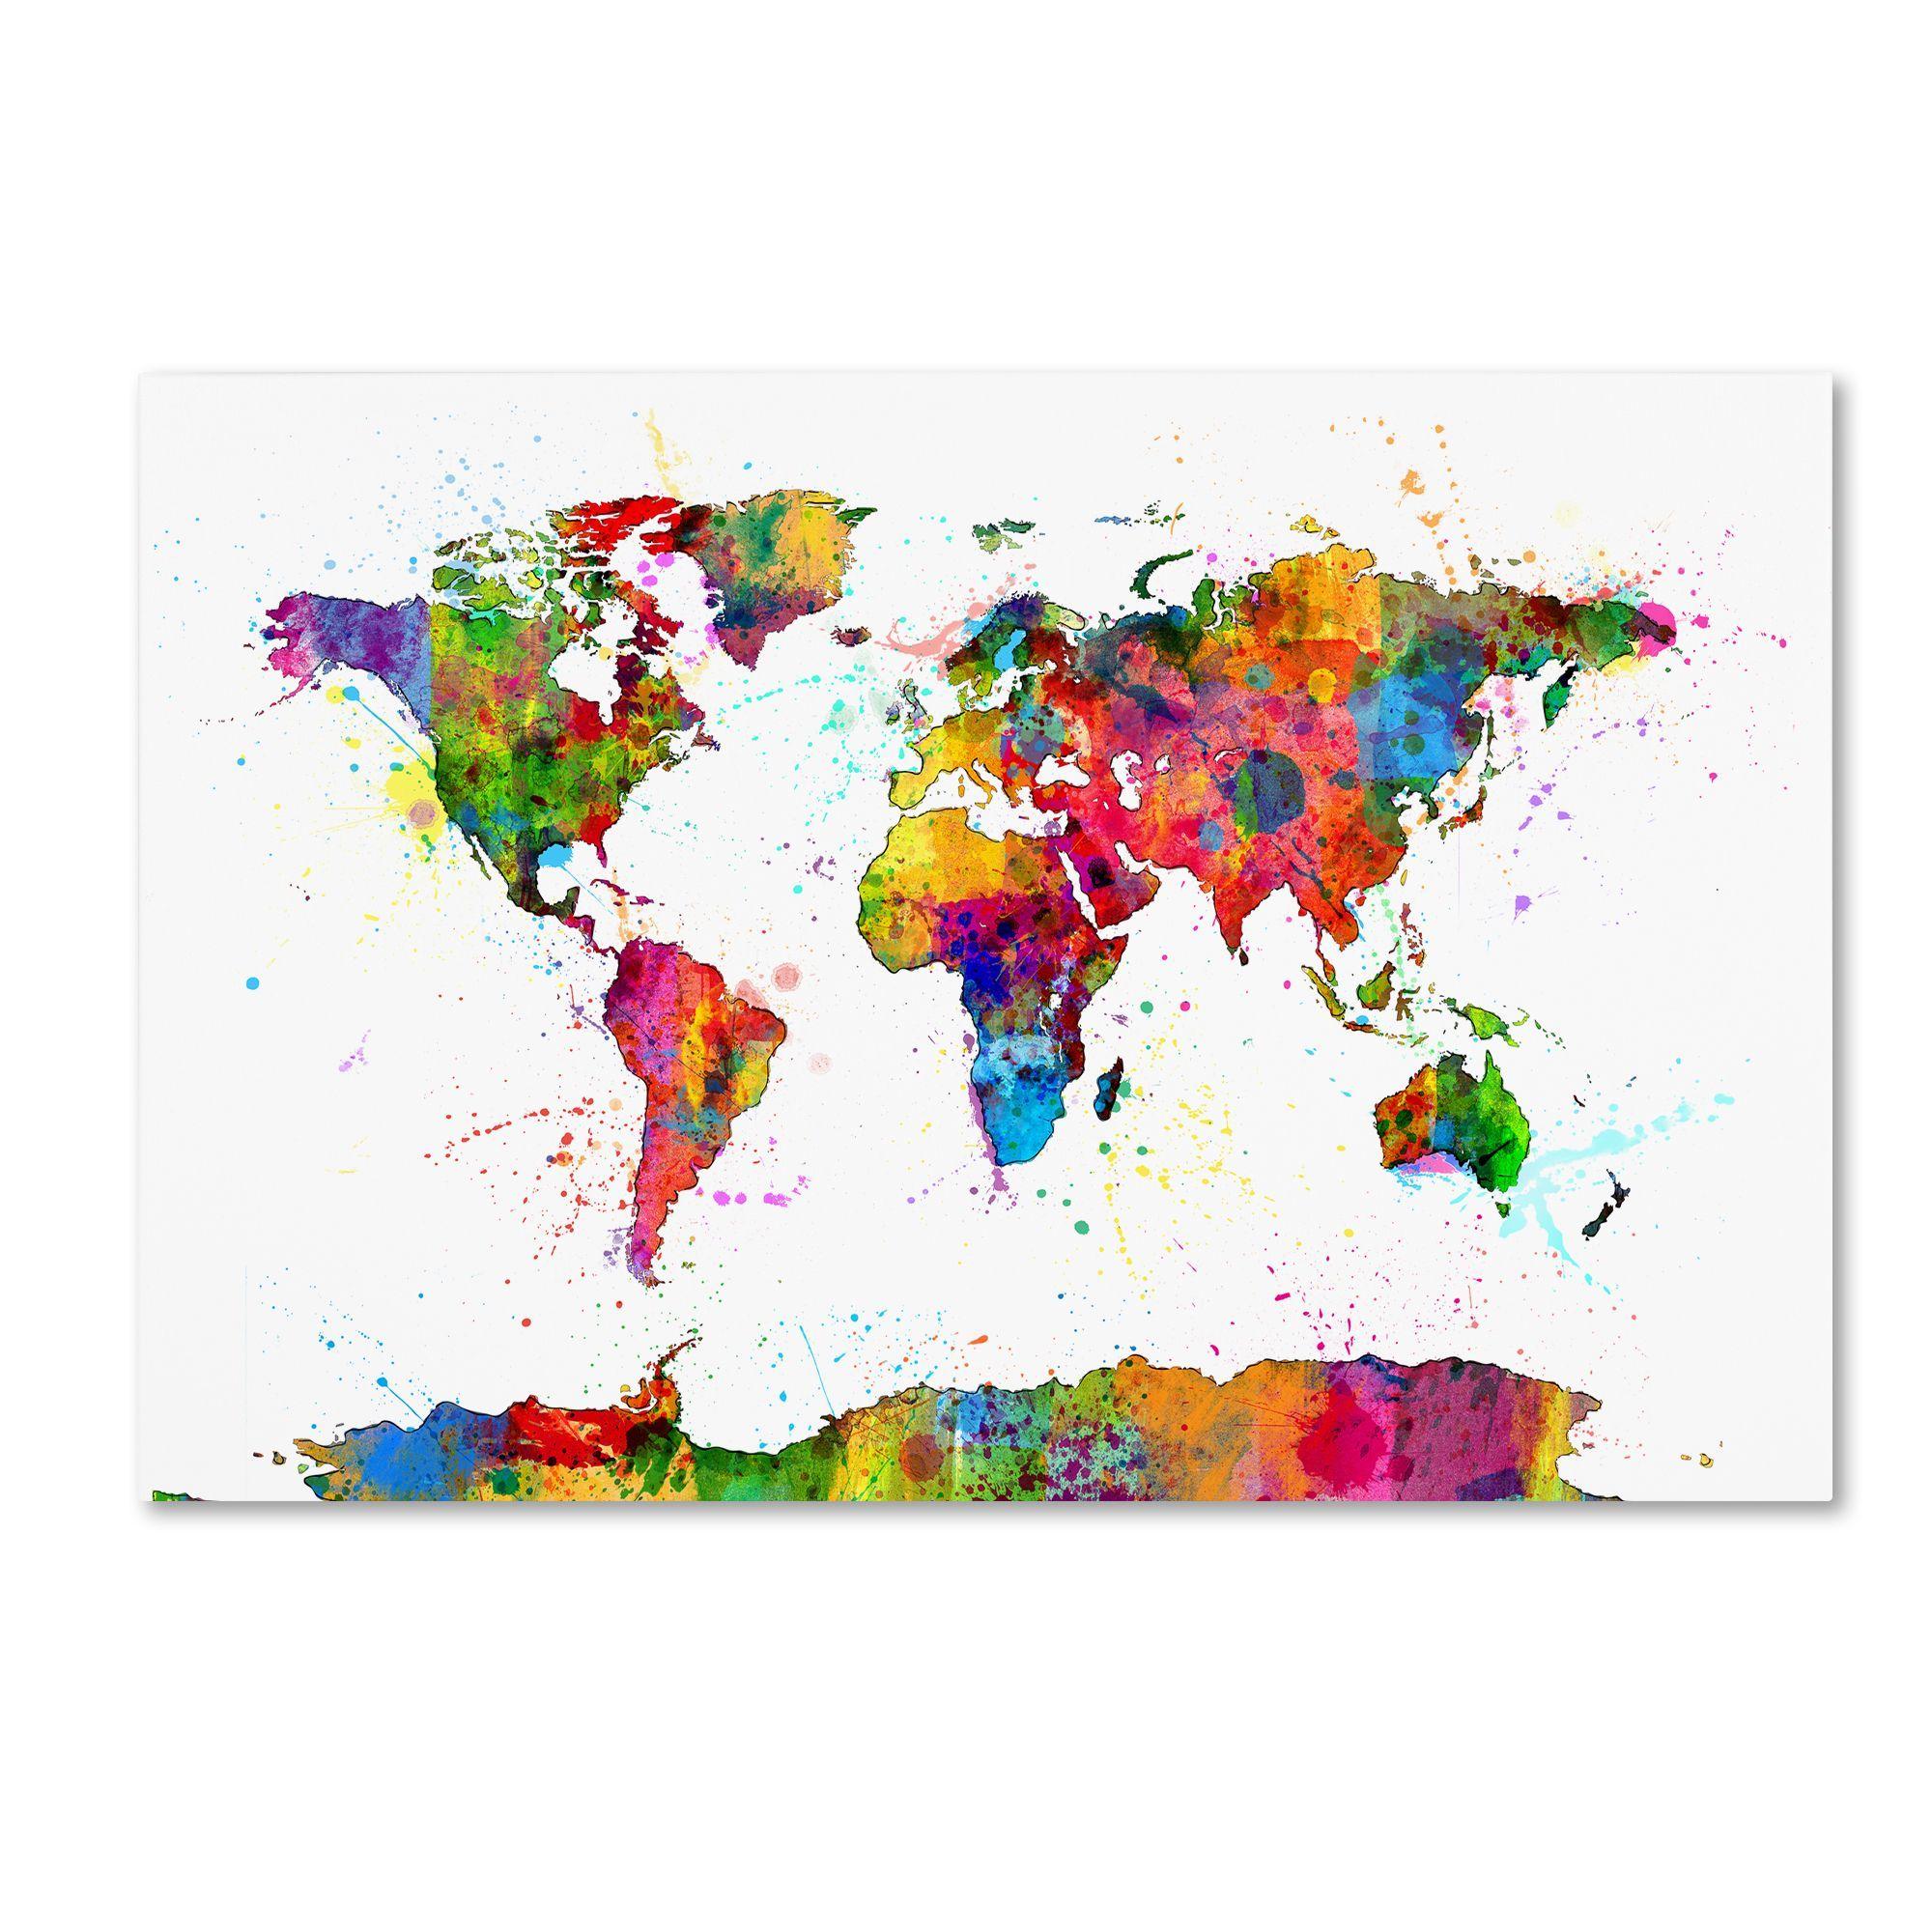 Michael tompsett map of the world watercolor canvas wall art 22 x michael tompsett map of the world watercolor canvas wall art gumiabroncs Gallery